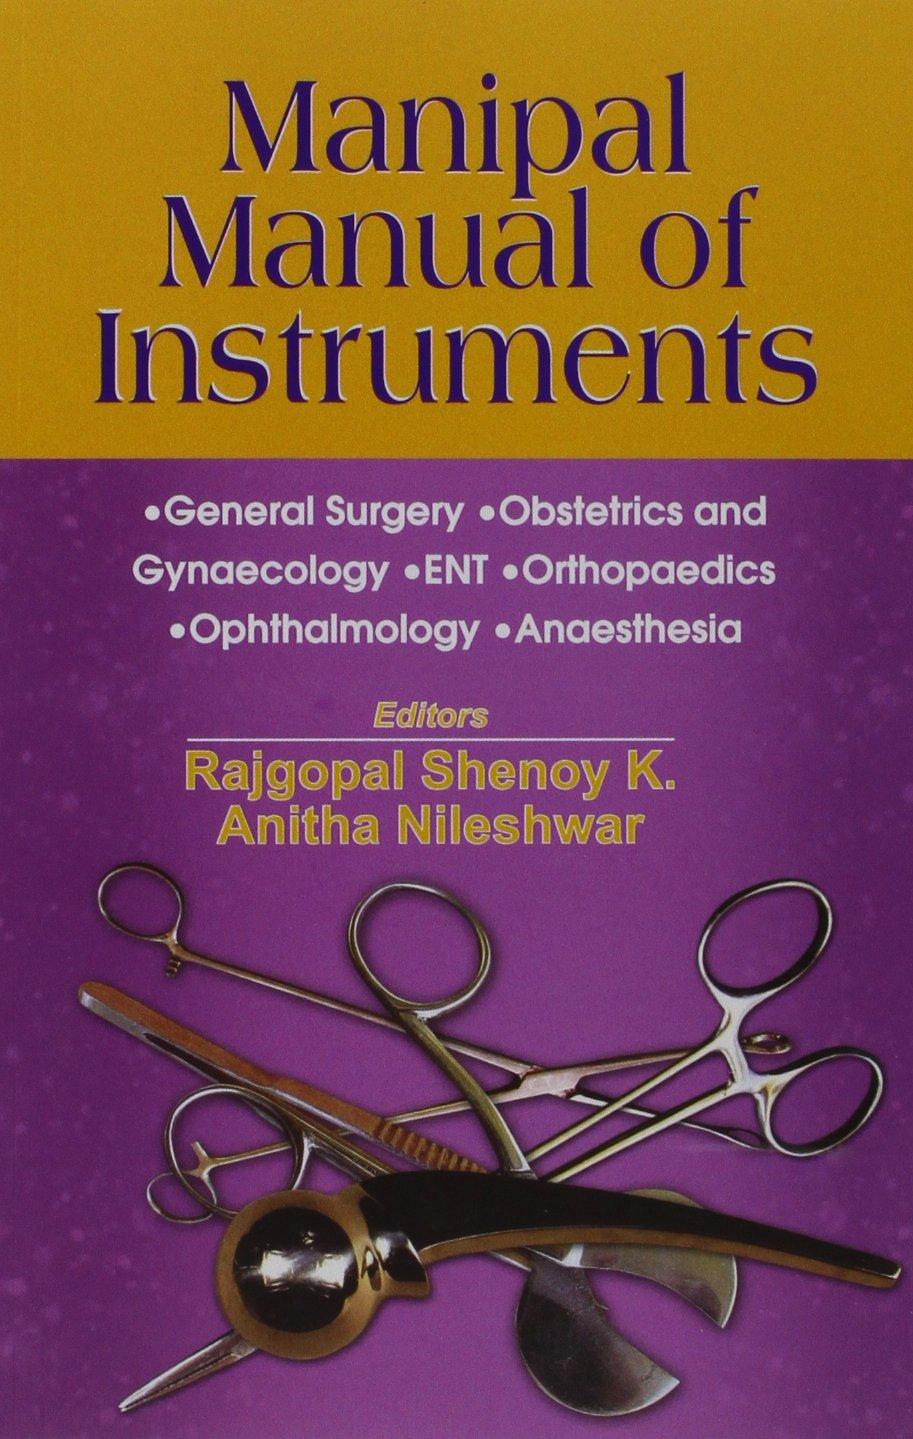 Manipal Manual of Instruments: Shenoy Rajgopal: 9788123918037: Amazon.com:  Books